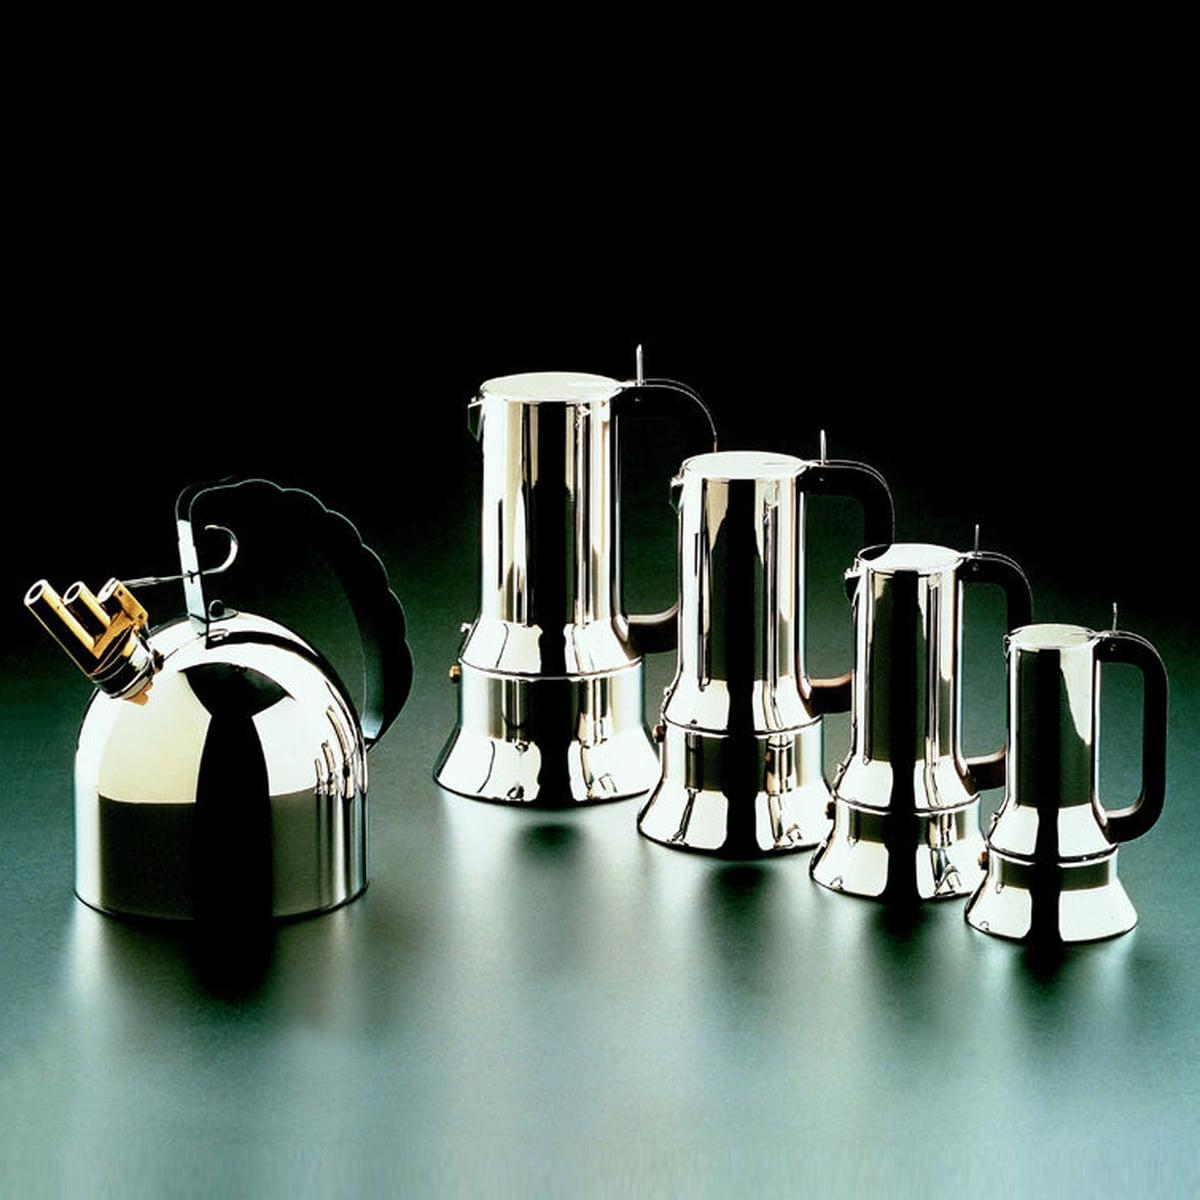 Kopjes Alessi 9090 66 Alessi Espressomachine pSqVGzMU